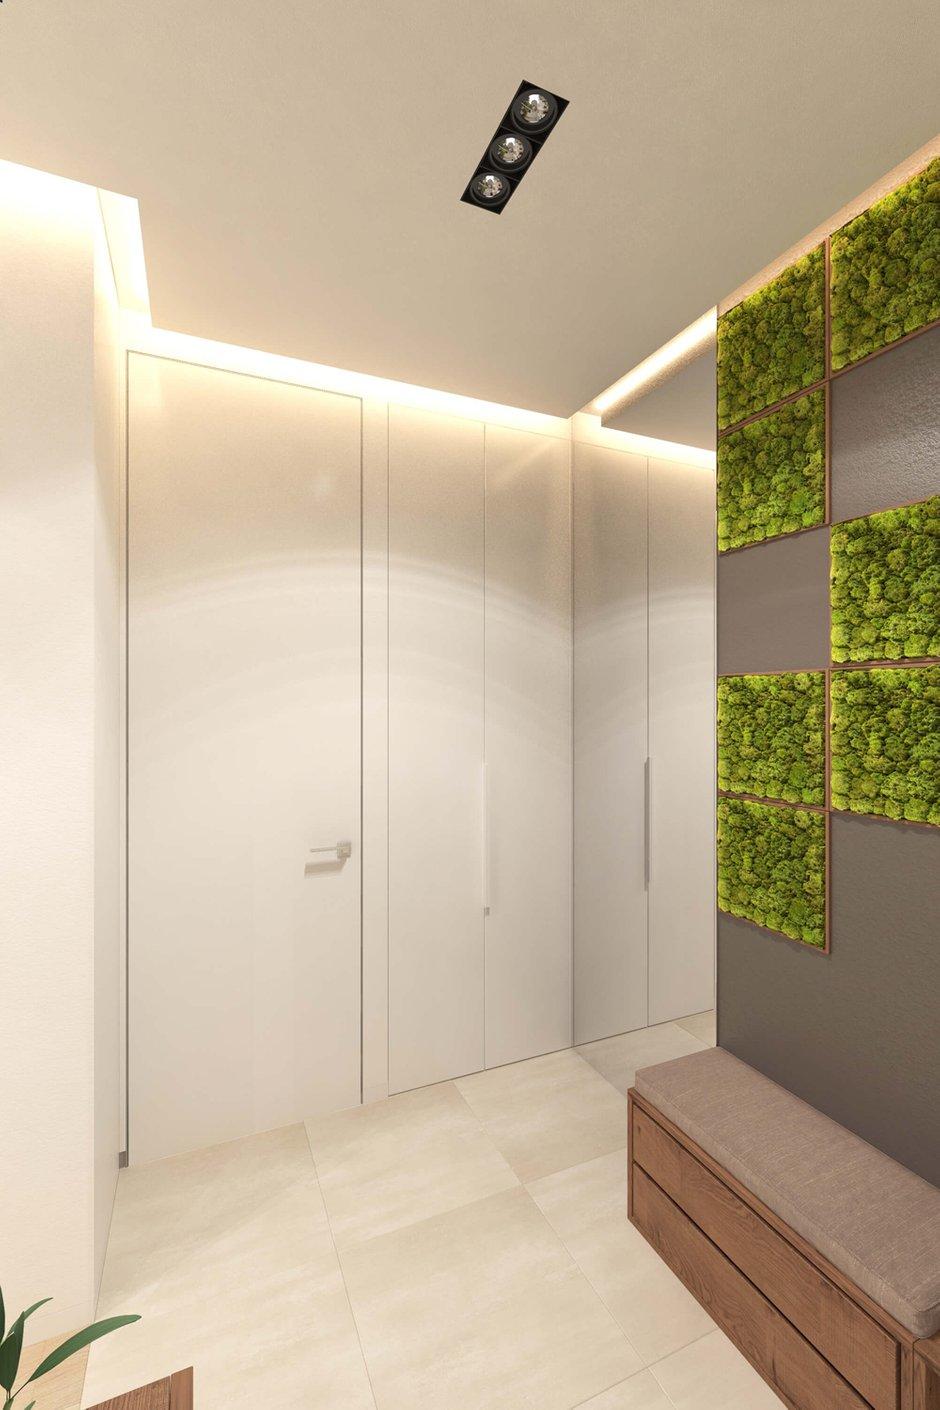 Фотография: Прихожая в стиле Эко, Квартира, Проект недели, Geometrium – фото на InMyRoom.ru